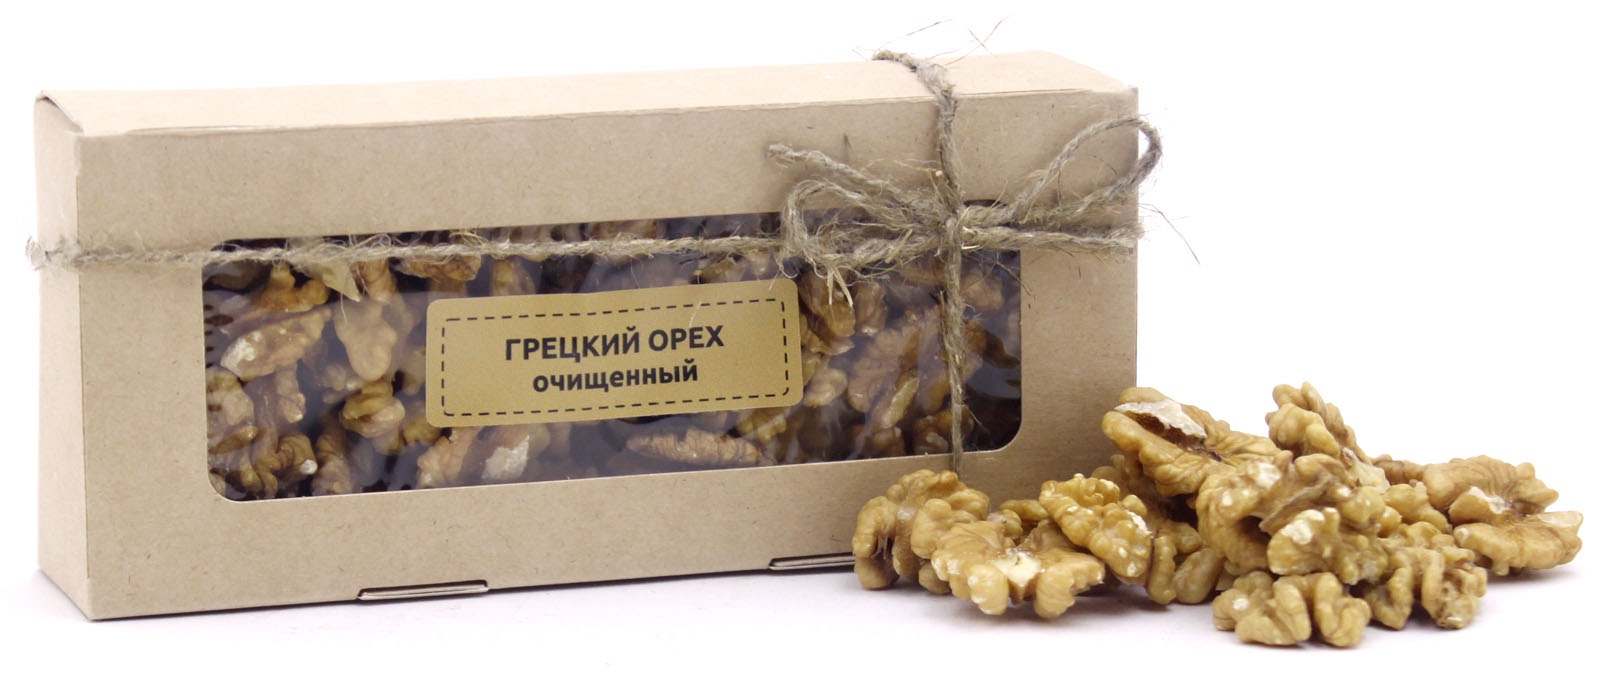 Орехи ВитаминФудс Грецкий орех очищенный Средняя азия, Грецкий орех